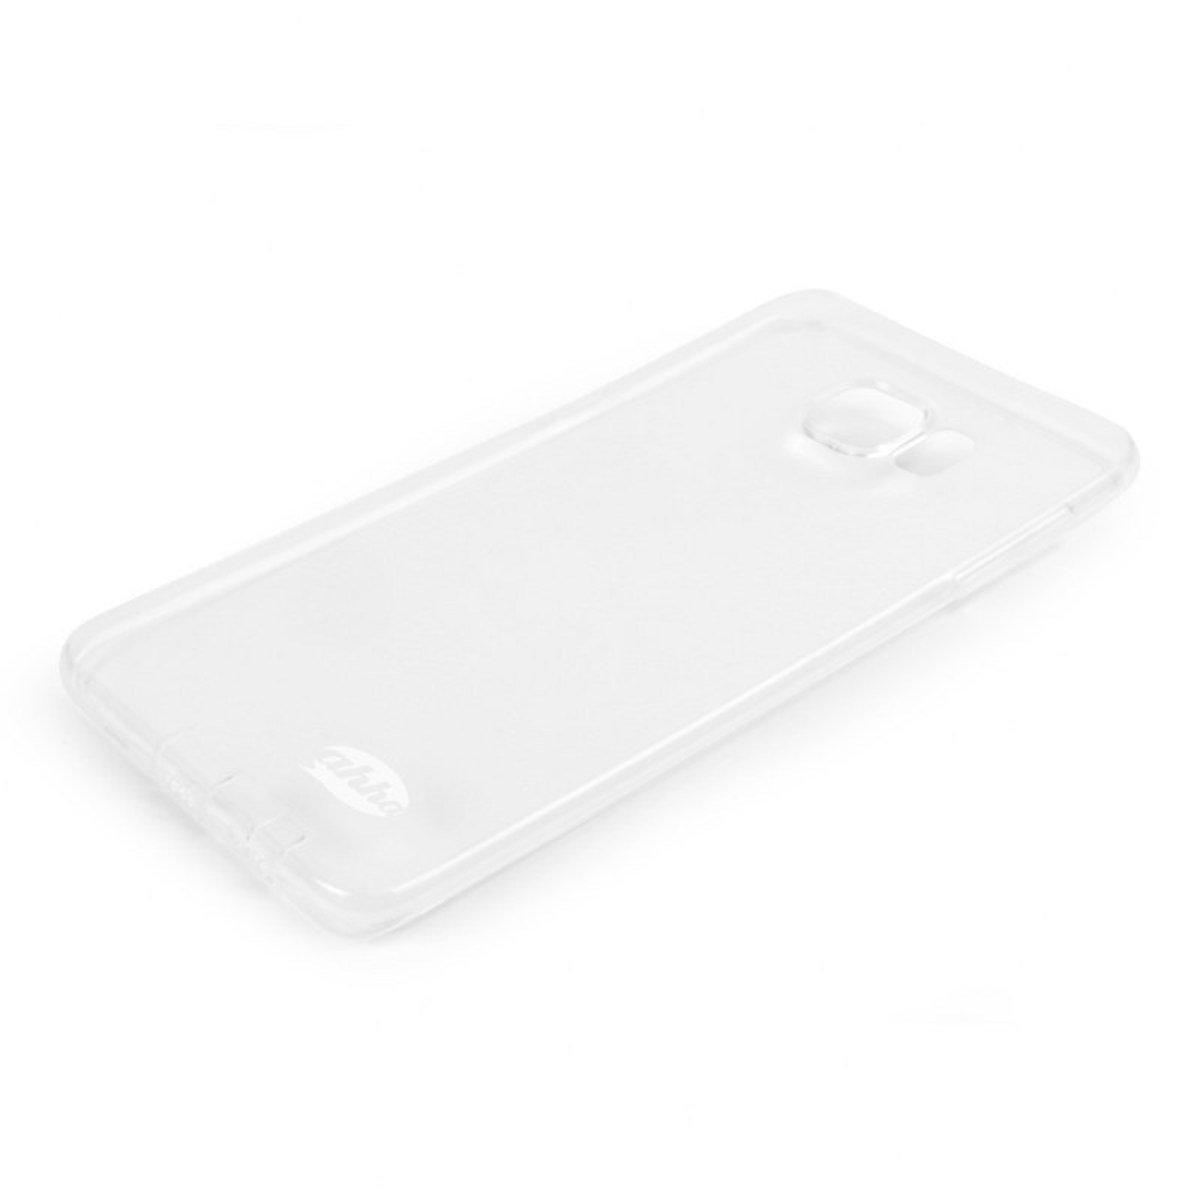 Samsung Galaxy S6 Edge Plus 手機保護殼 GummiShell SKINNY MOYA (透明)